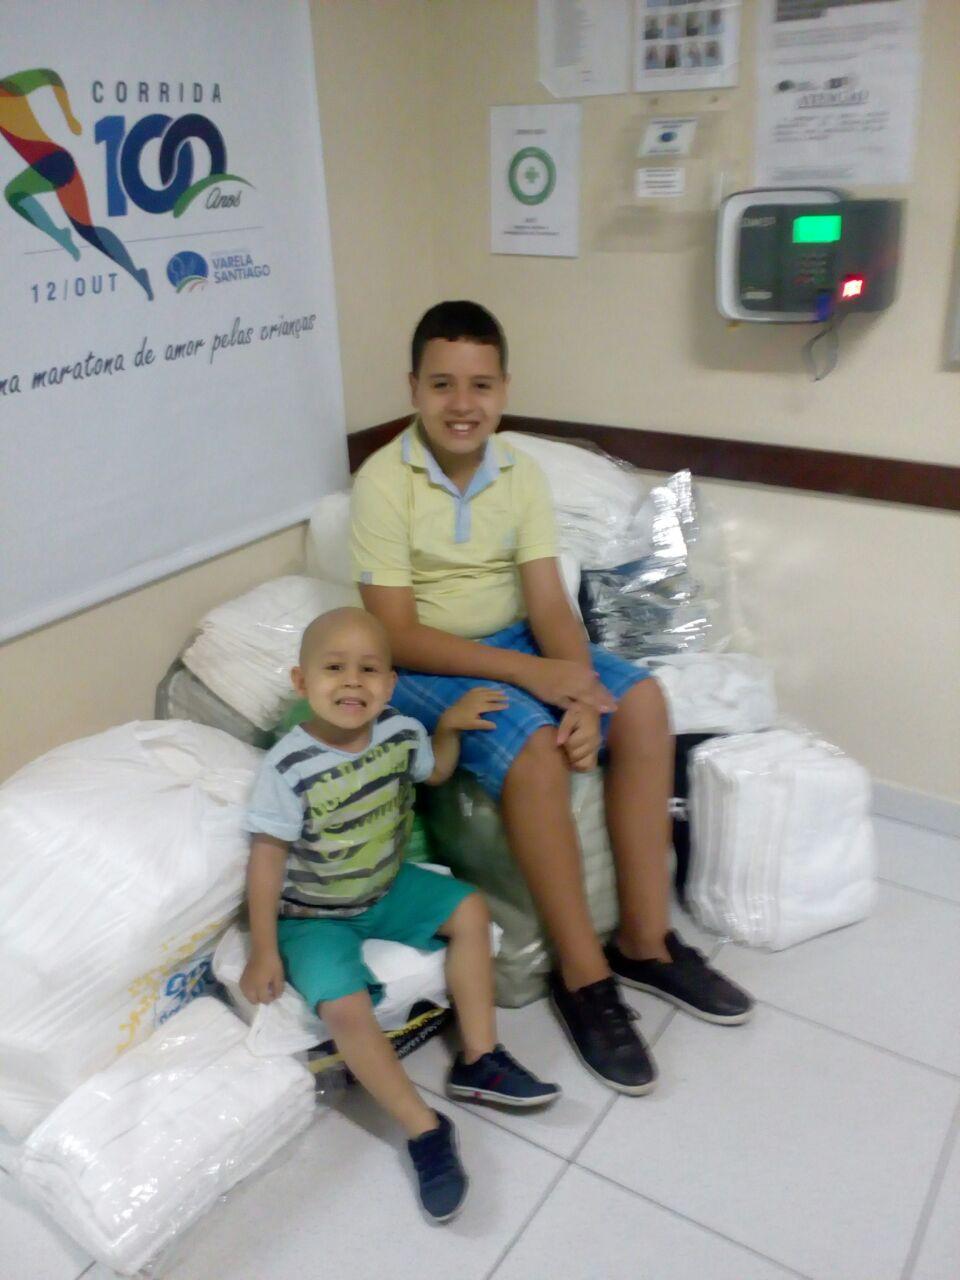 http://hospitalvarelasantiago.org.br/wp-content/uploads/2017/07/IMG-20170707-WA0027-1.jpg